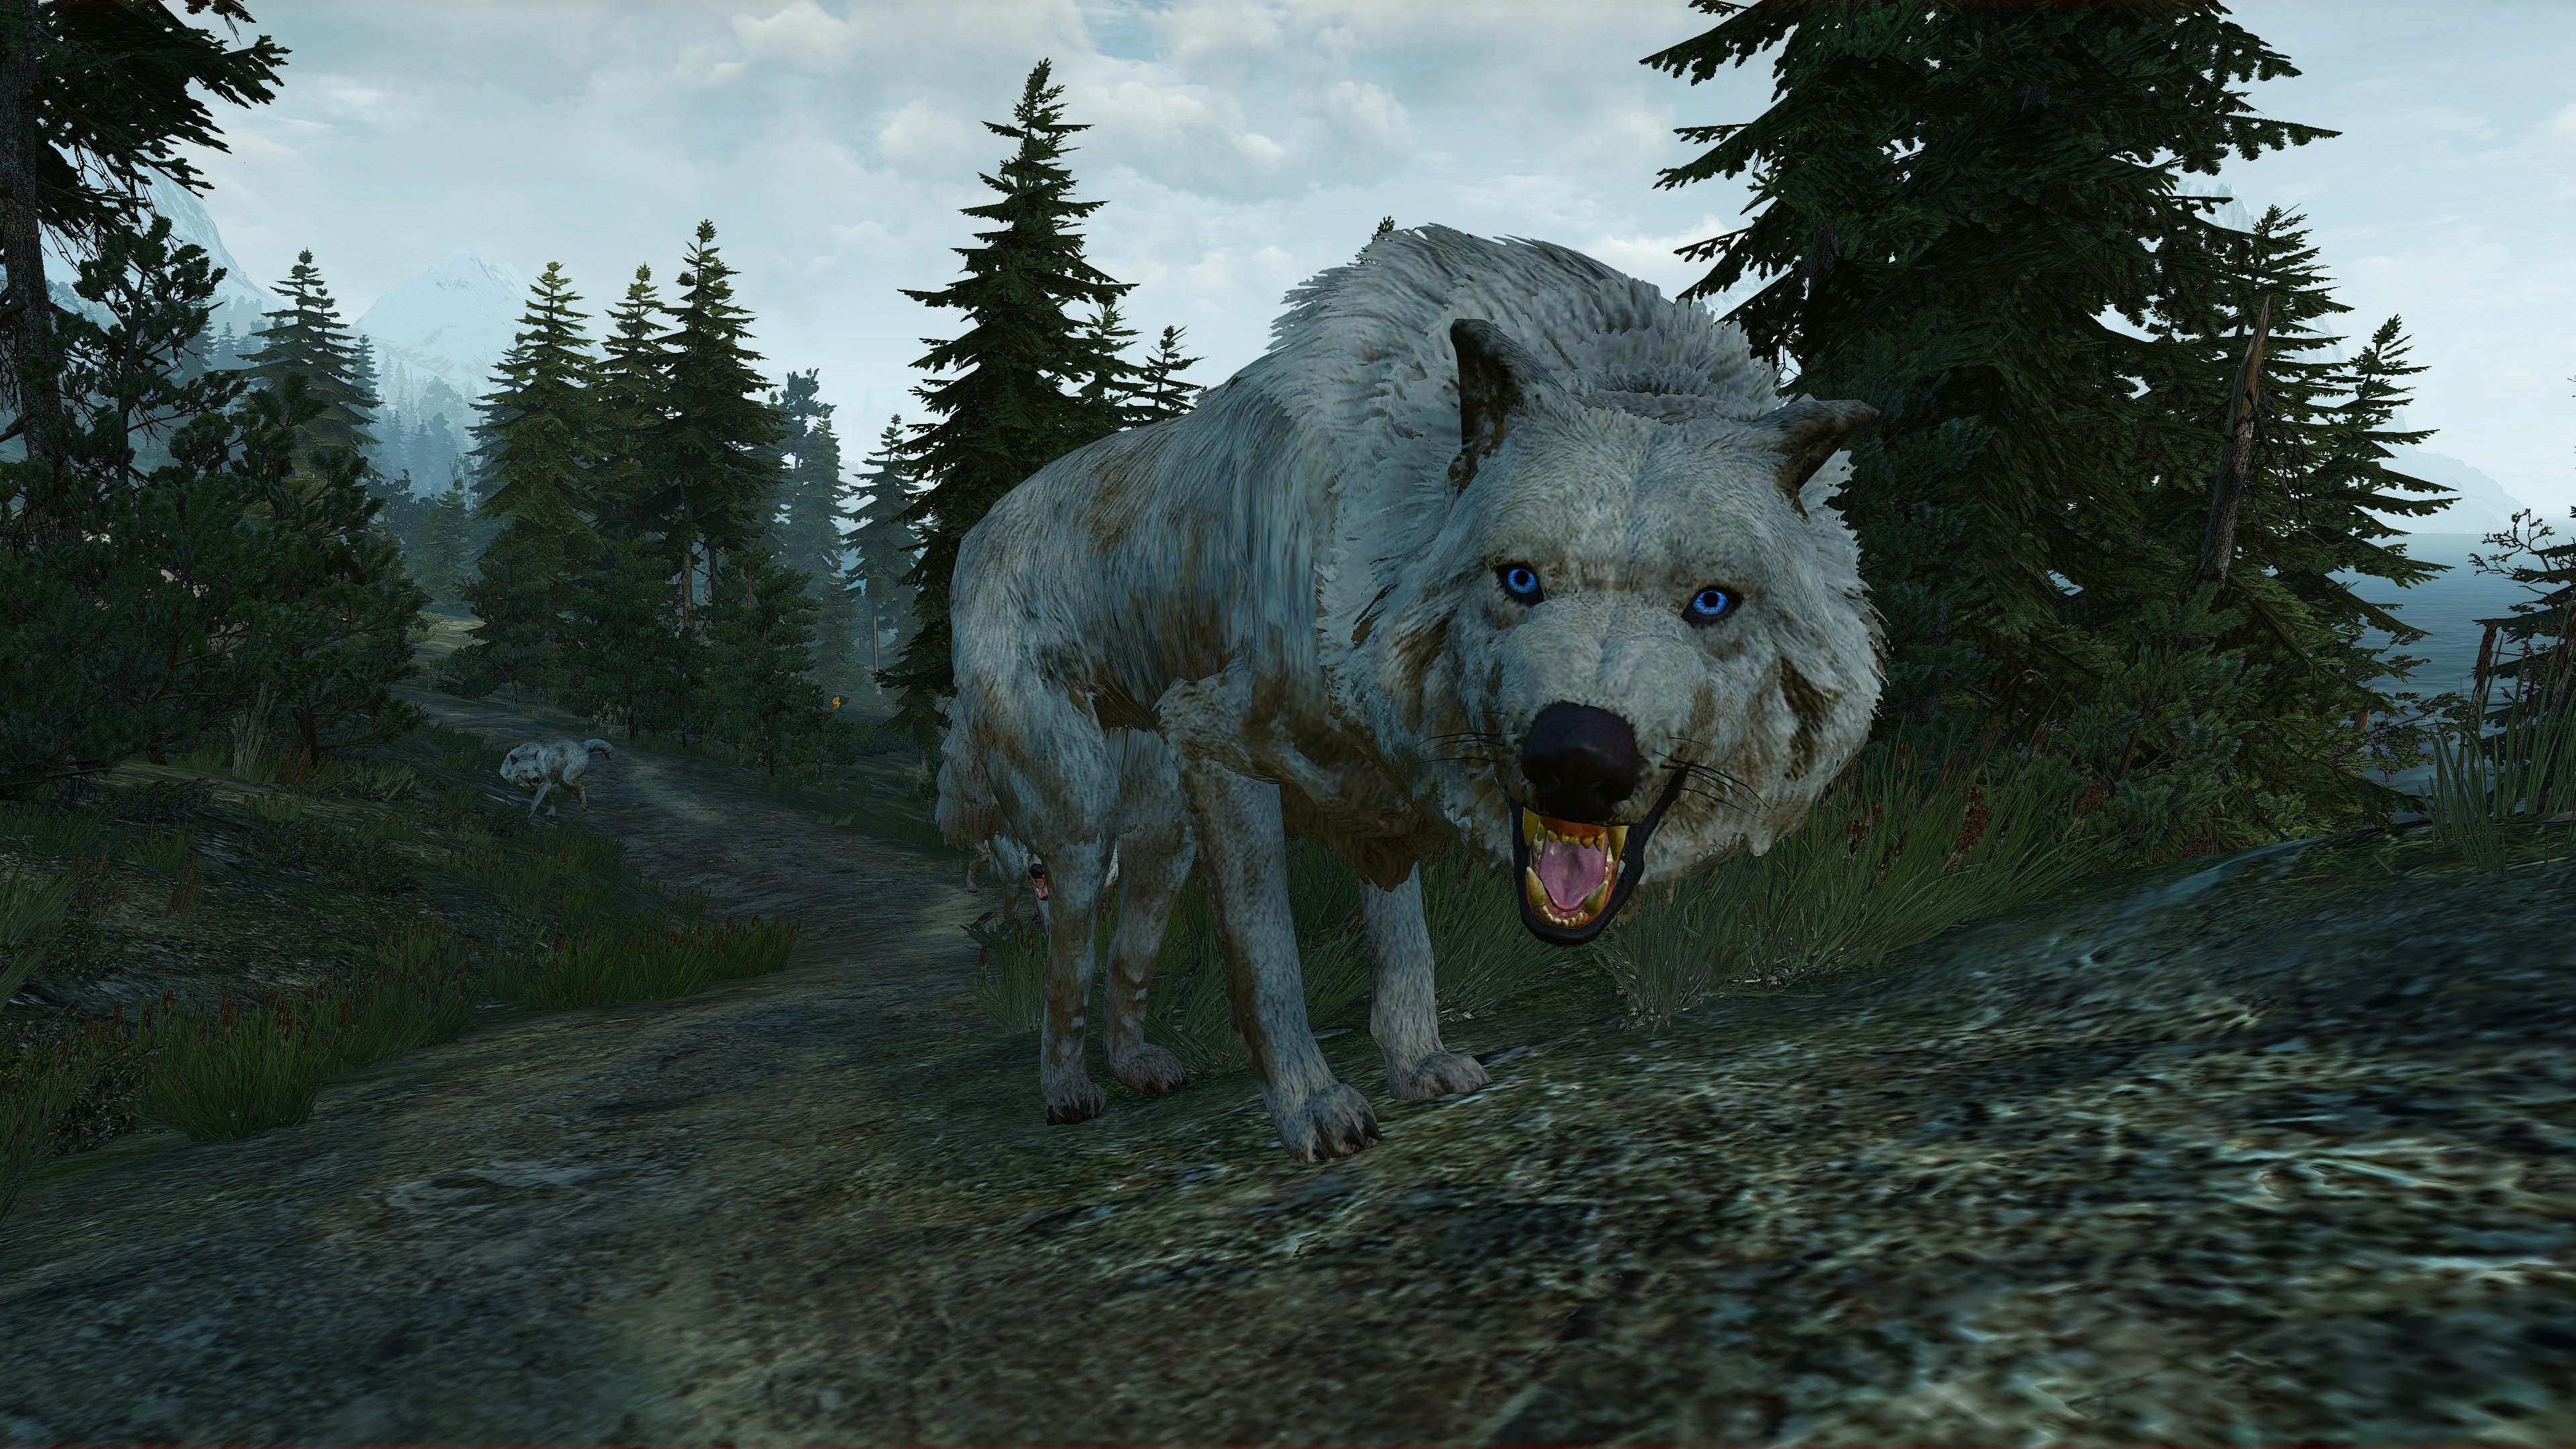 The Witcher 3 Screenshot 2020.07.26 - 12.59.18.jpg - The Witcher 3: Wild Hunt